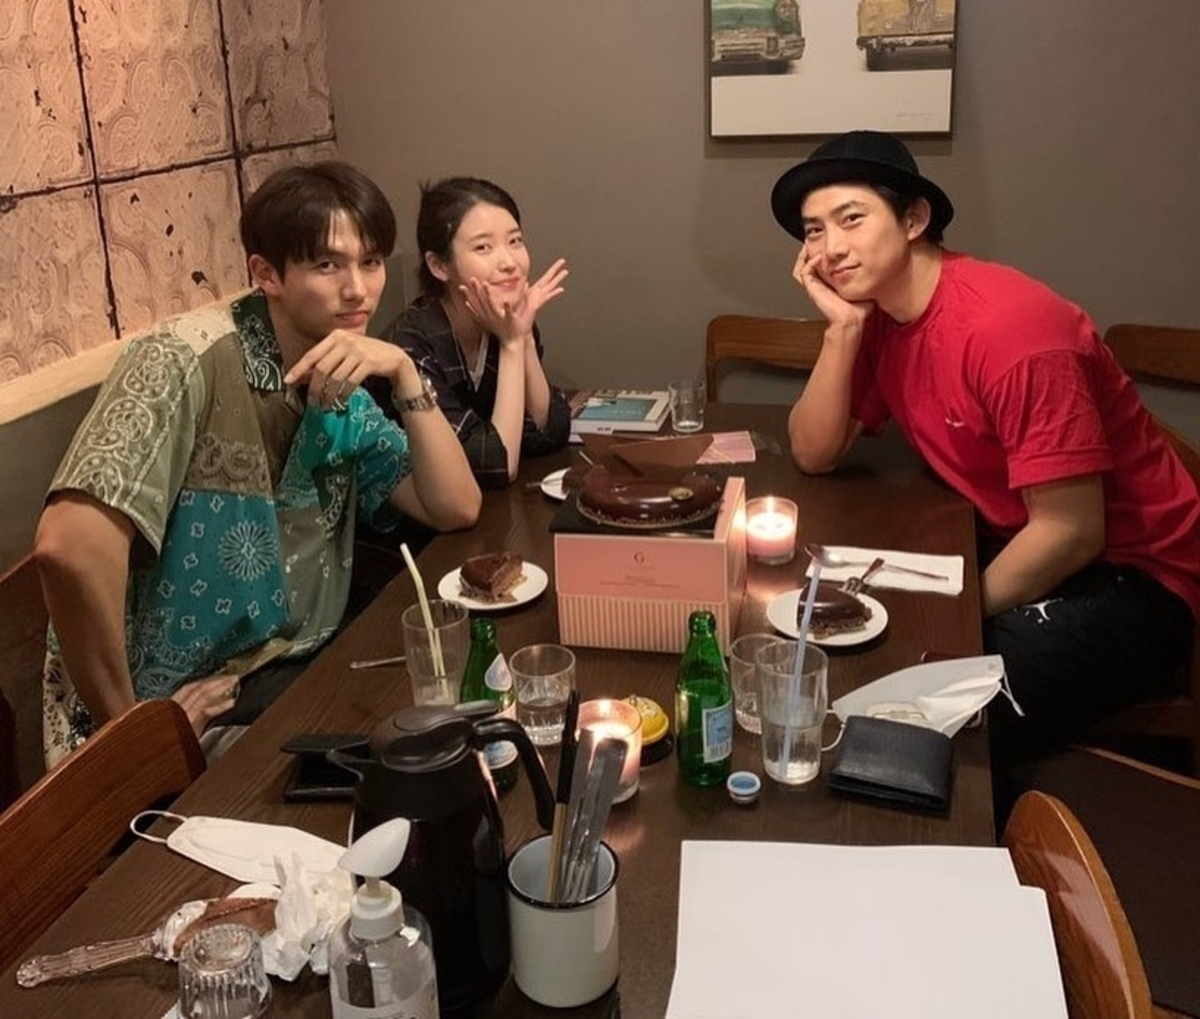 2AM任瑟雍,与IU&2PM玉泽演举行生日会 豪华成员的照片引起反响